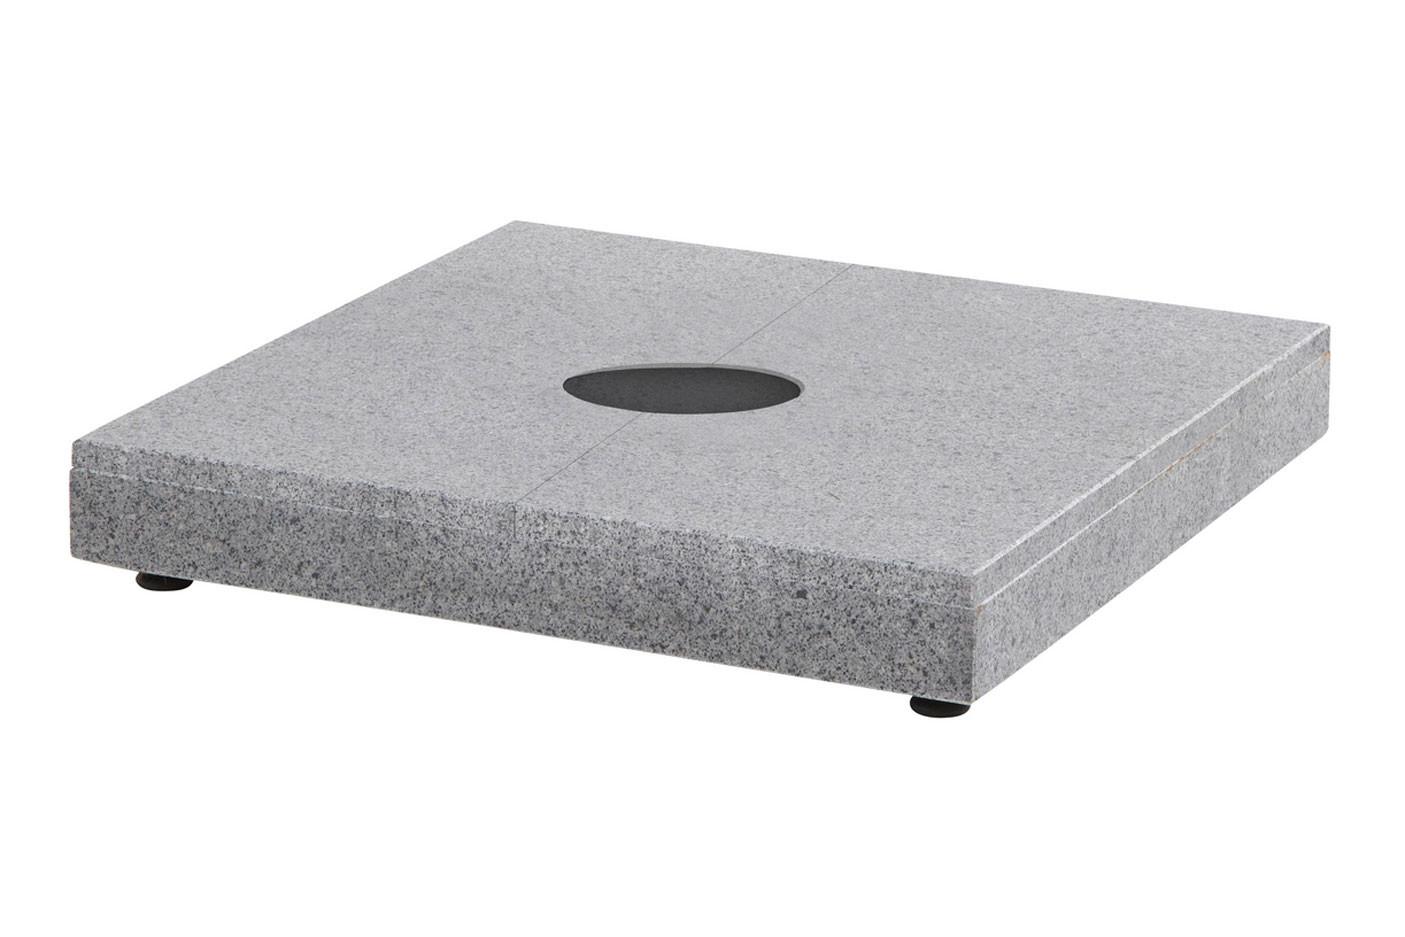 Granite base Anthracite 180 kgs.